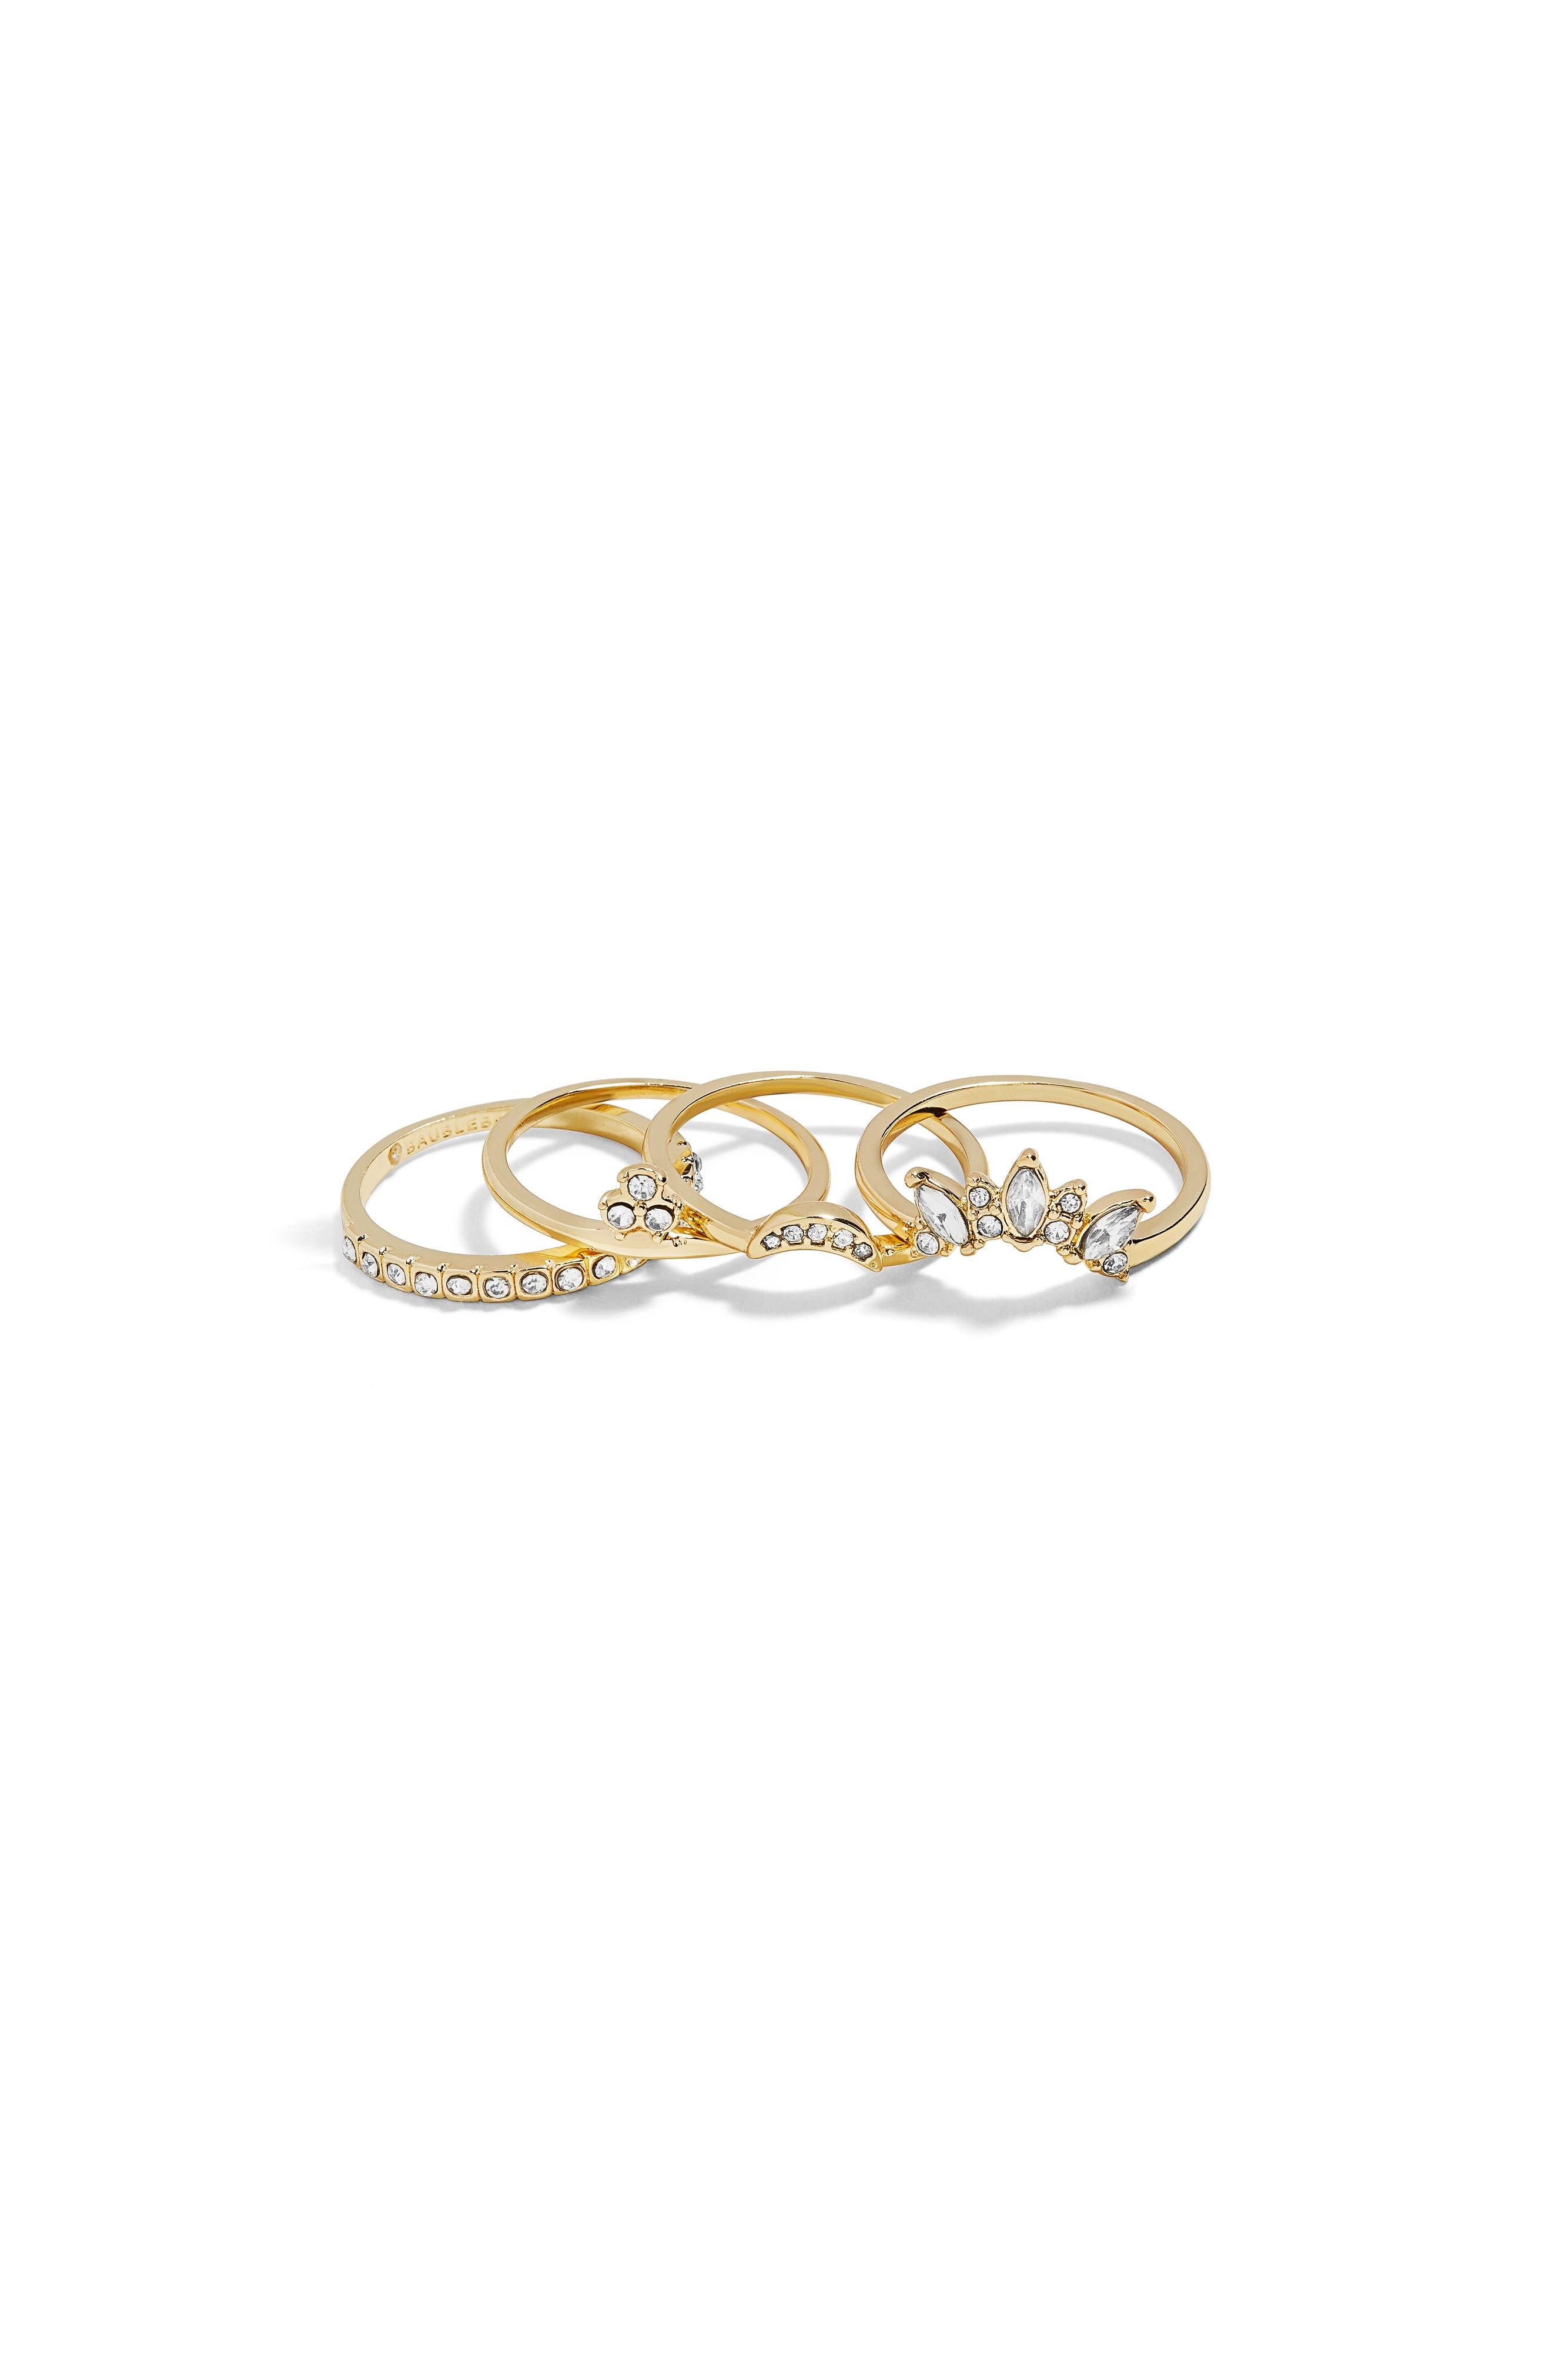 4-Pack Regime Ring Set,                             Main thumbnail 1, color,                             GOLD